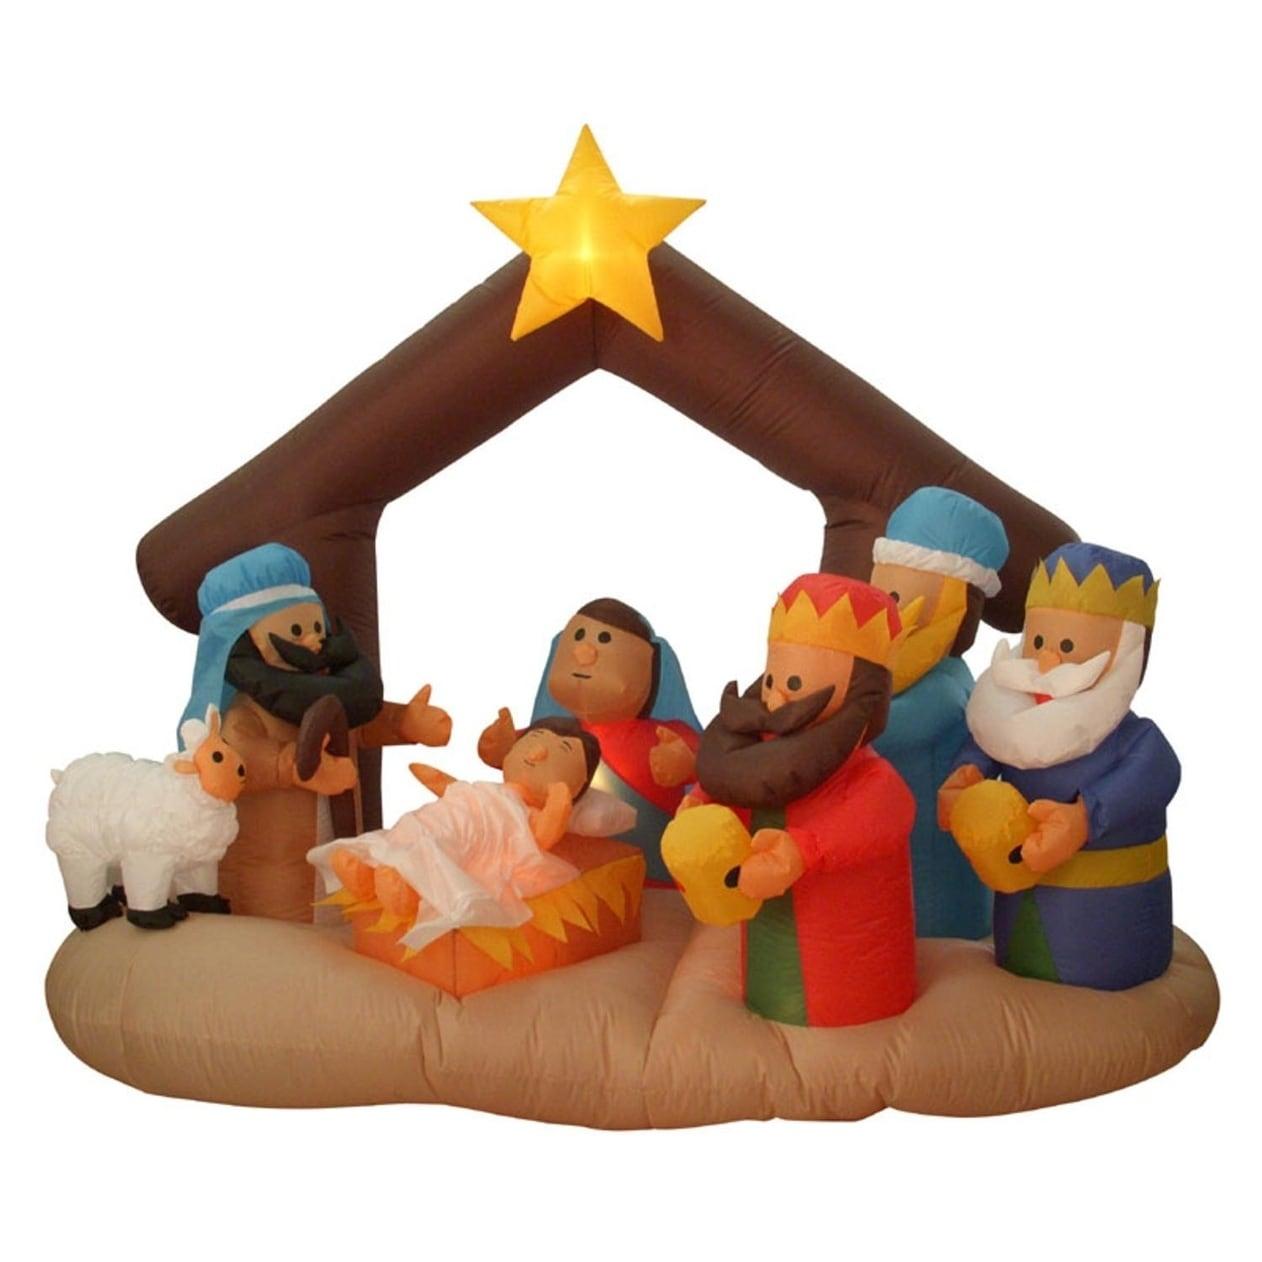 6.5' Inflatable Nativity Scene Lighted Christmas Yard Art...